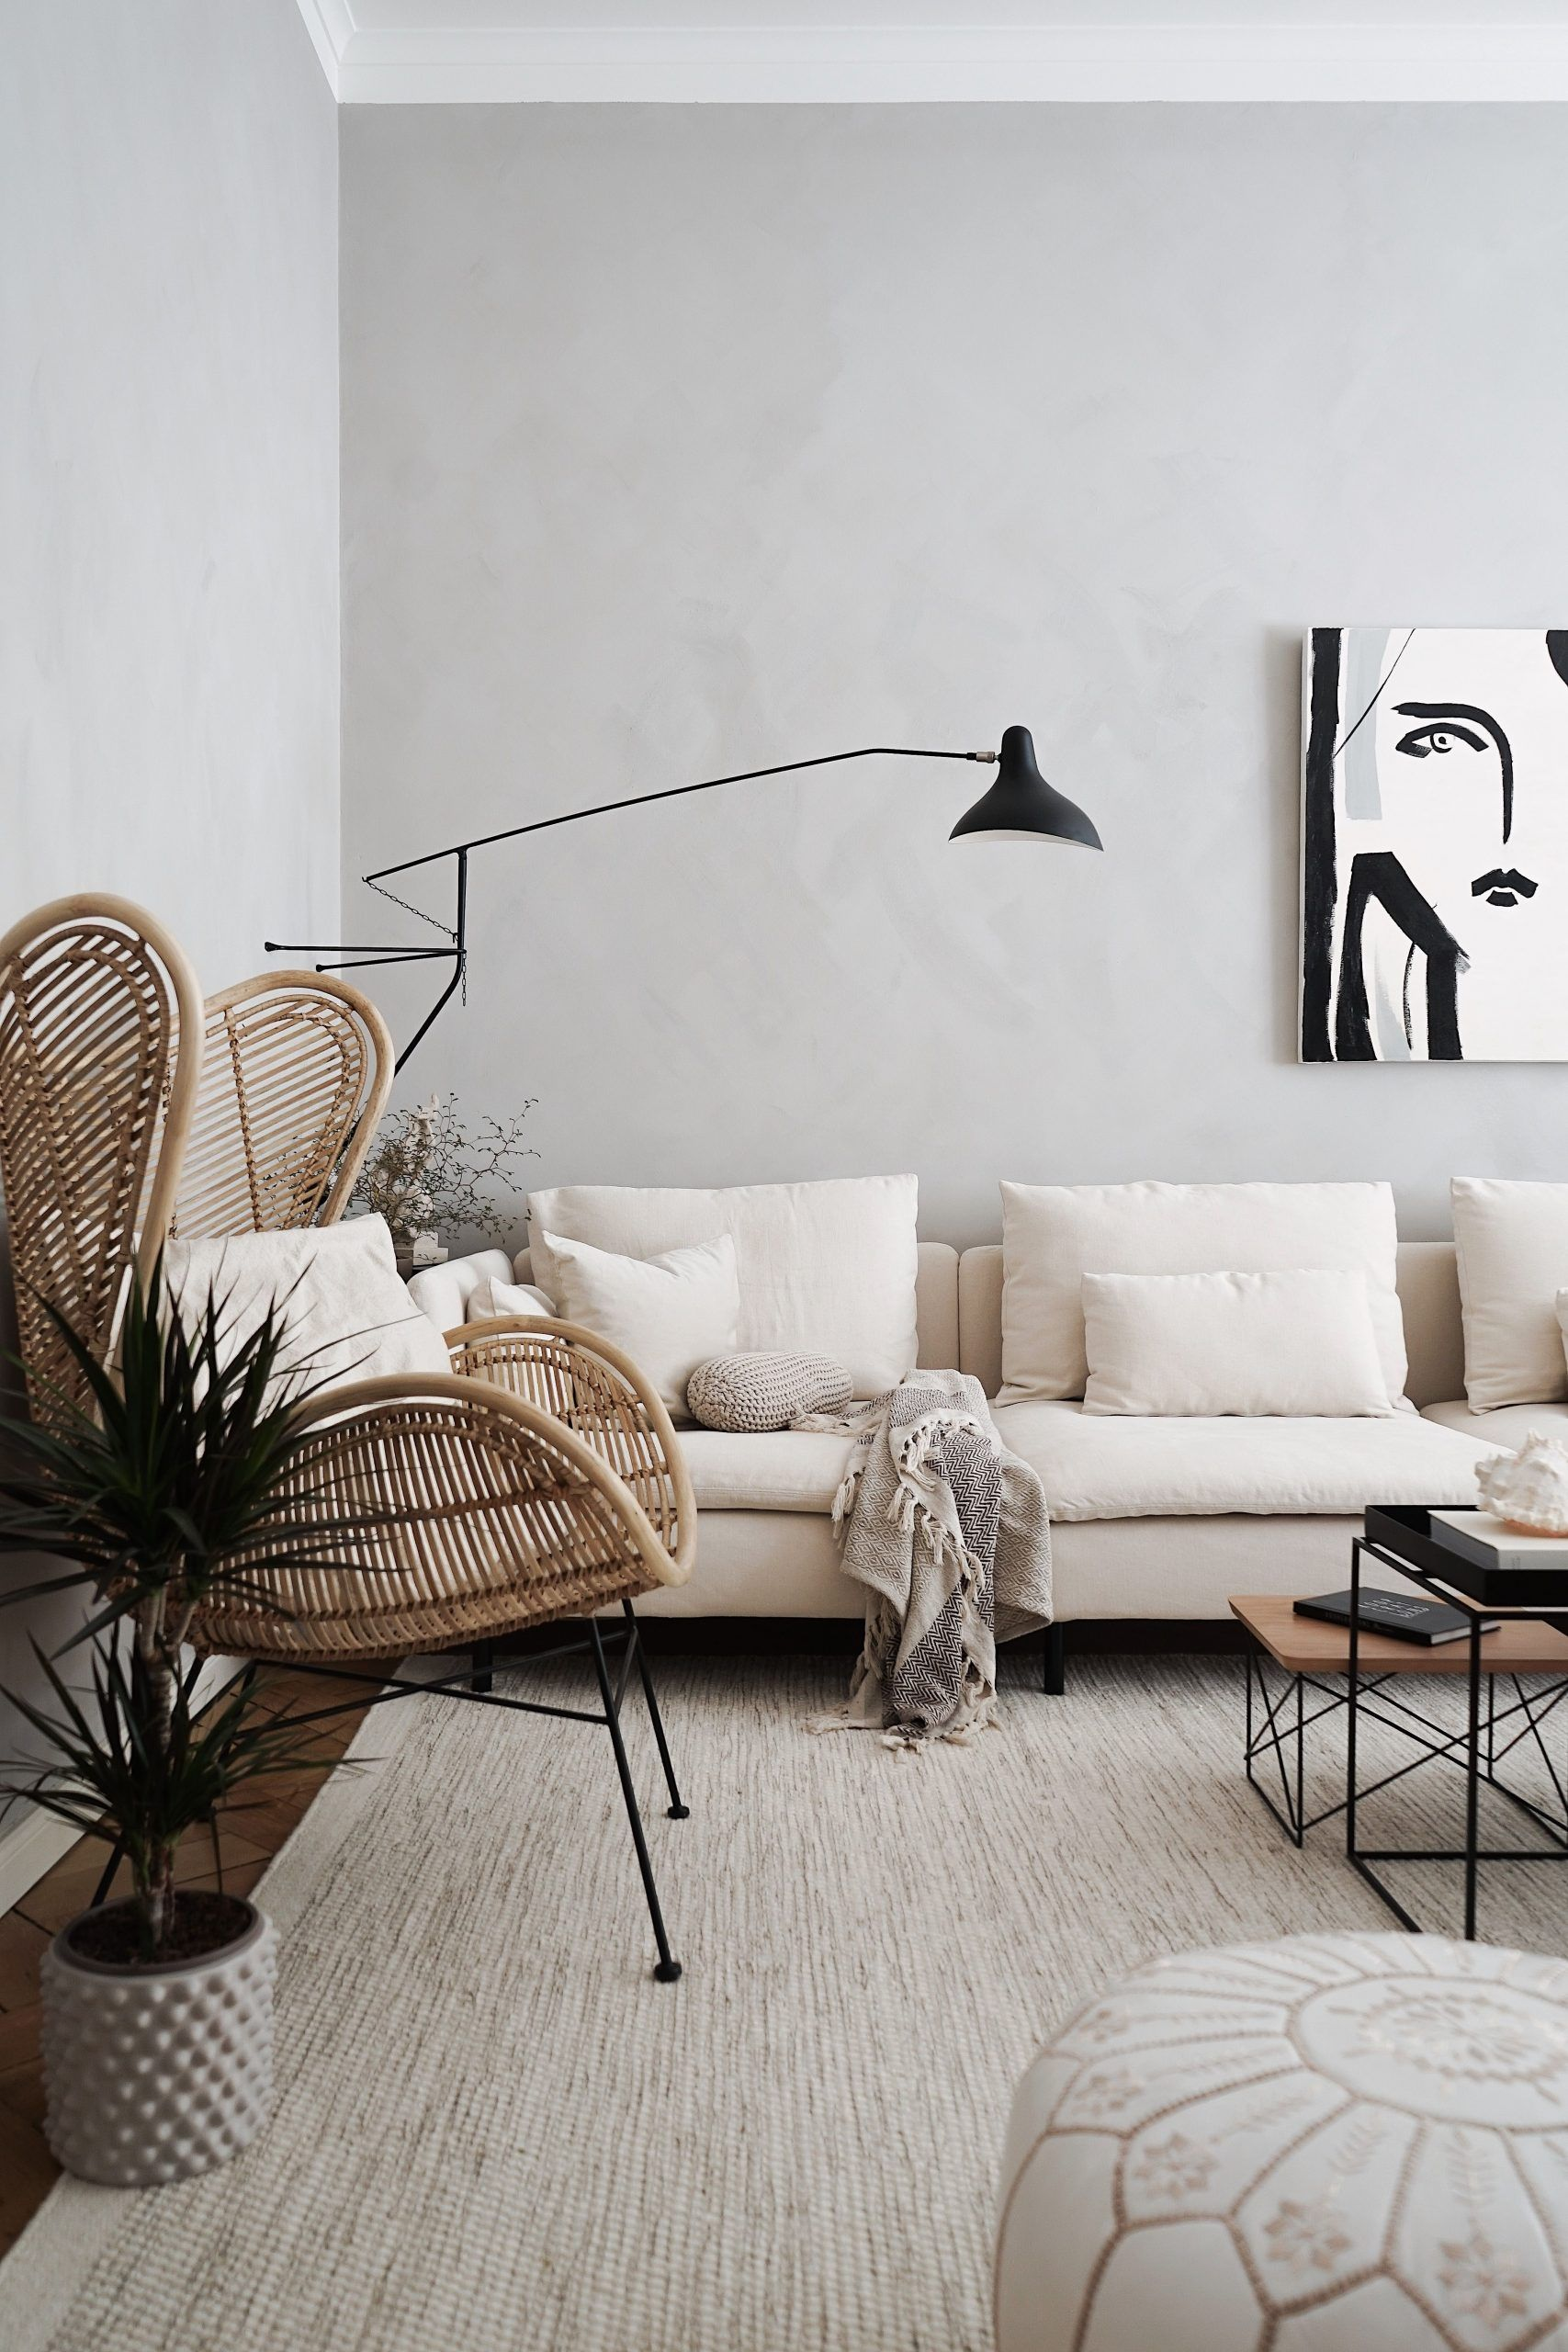 Ikea Soderhamn 3 Sitzer Sofabezug Bemz Bemz 3sitzersofabezug Bemz Ikea Soderhamn In 2020 Living Room Scandinavian Living Room Designs Living Room Inspo